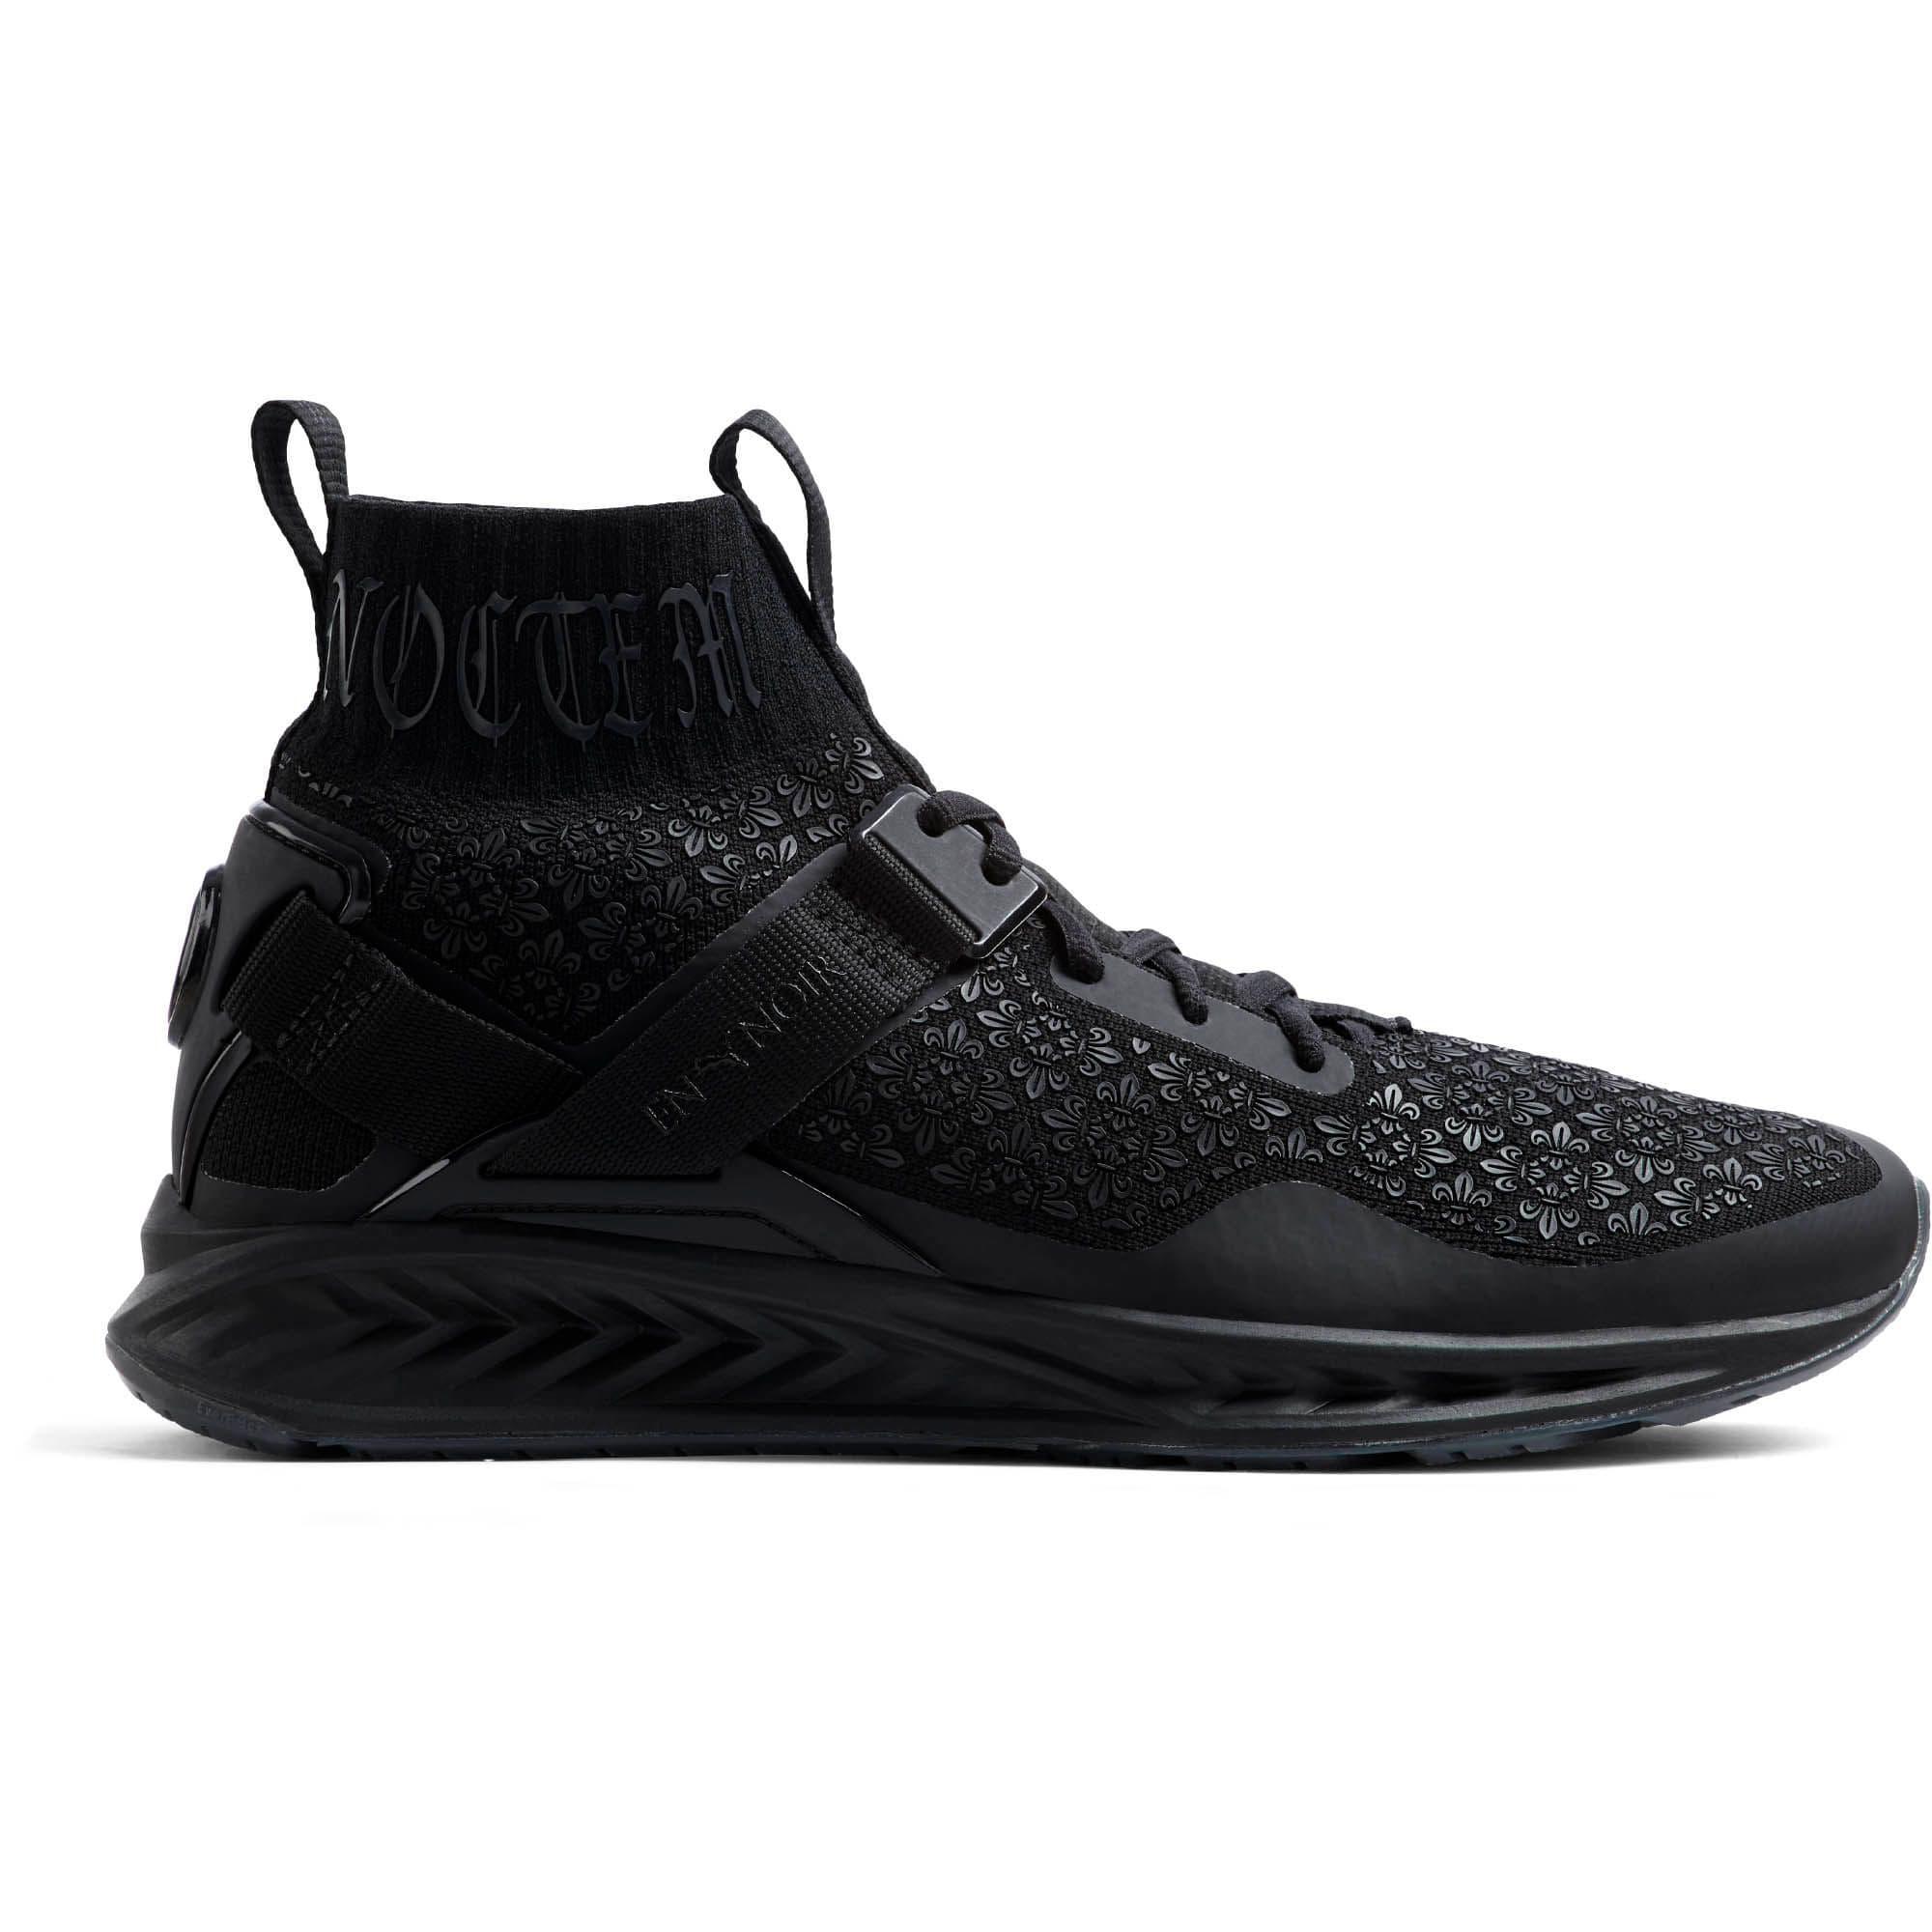 Thumbnail 1 of IGNITE evoKNIT En Noir Men's Training Shoes, Puma Black-Puma Black, medium